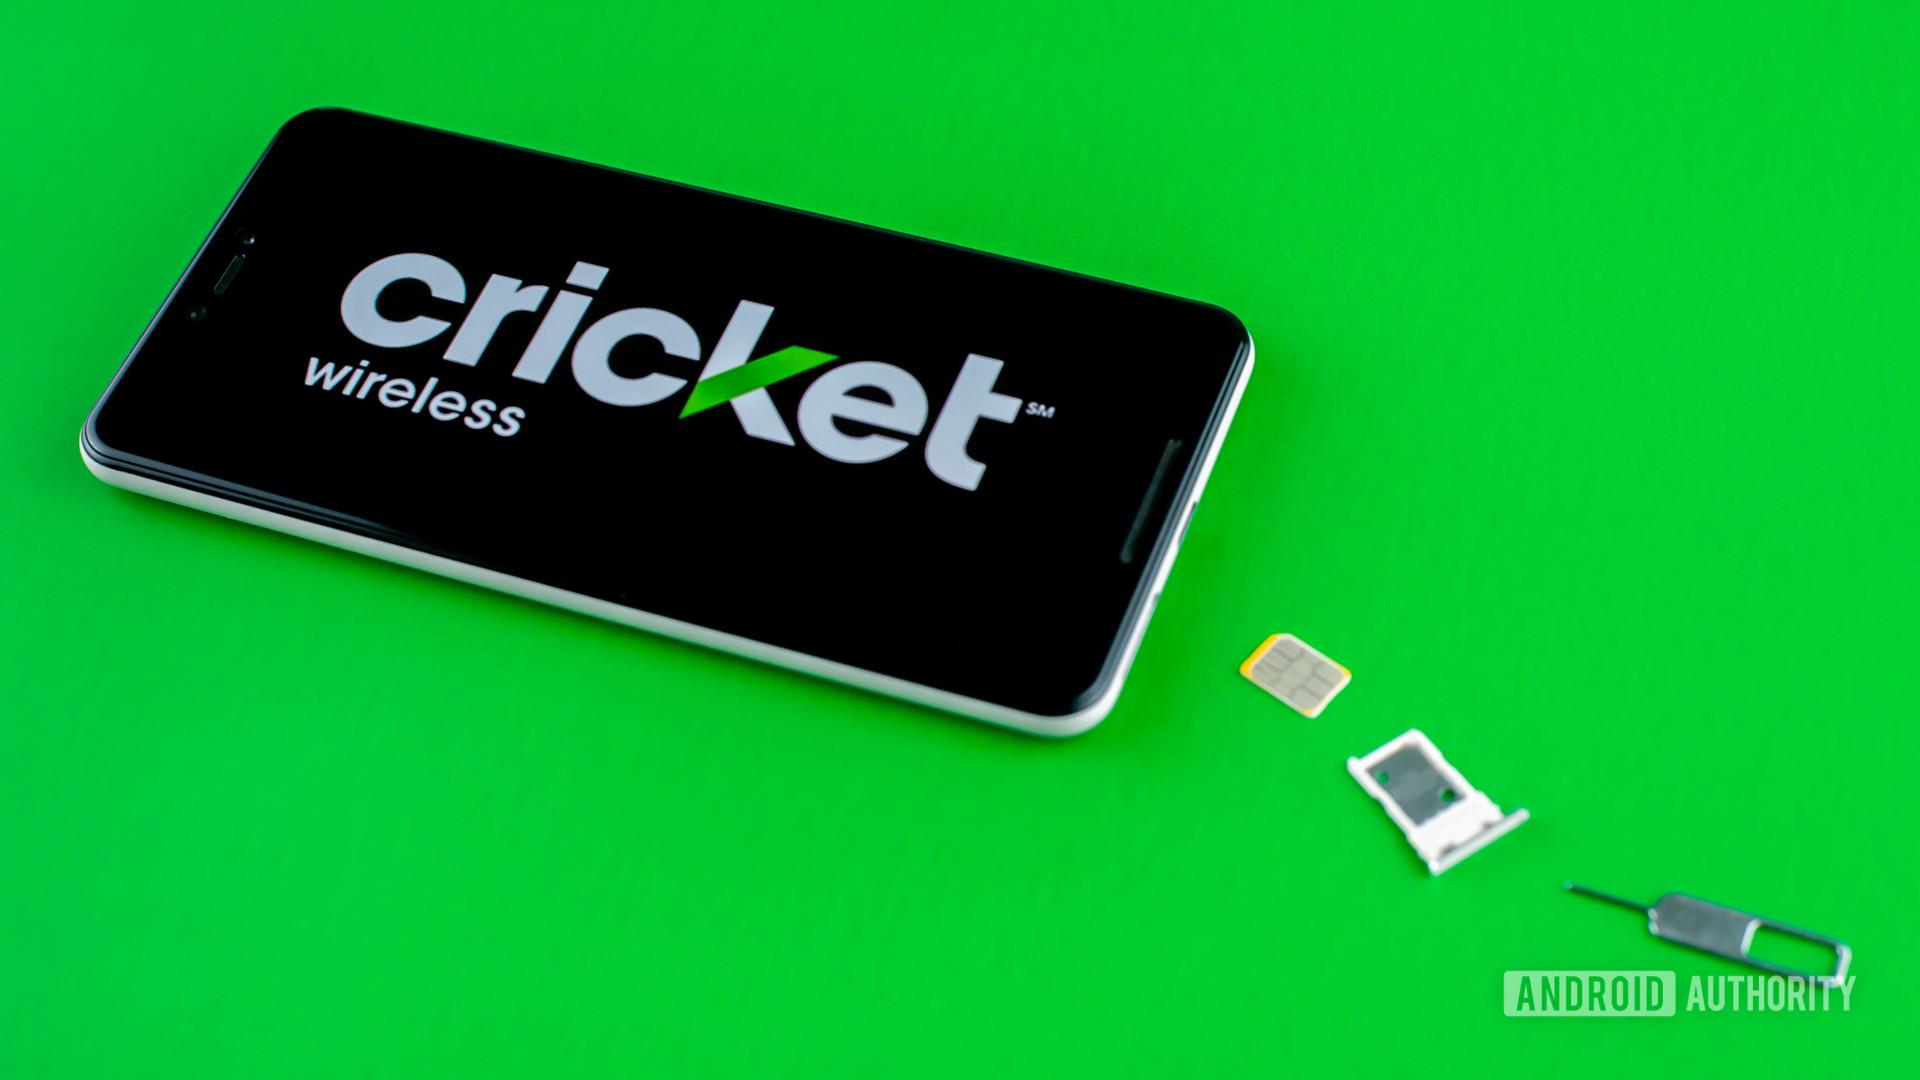 Cricket Wireless stock photo 2